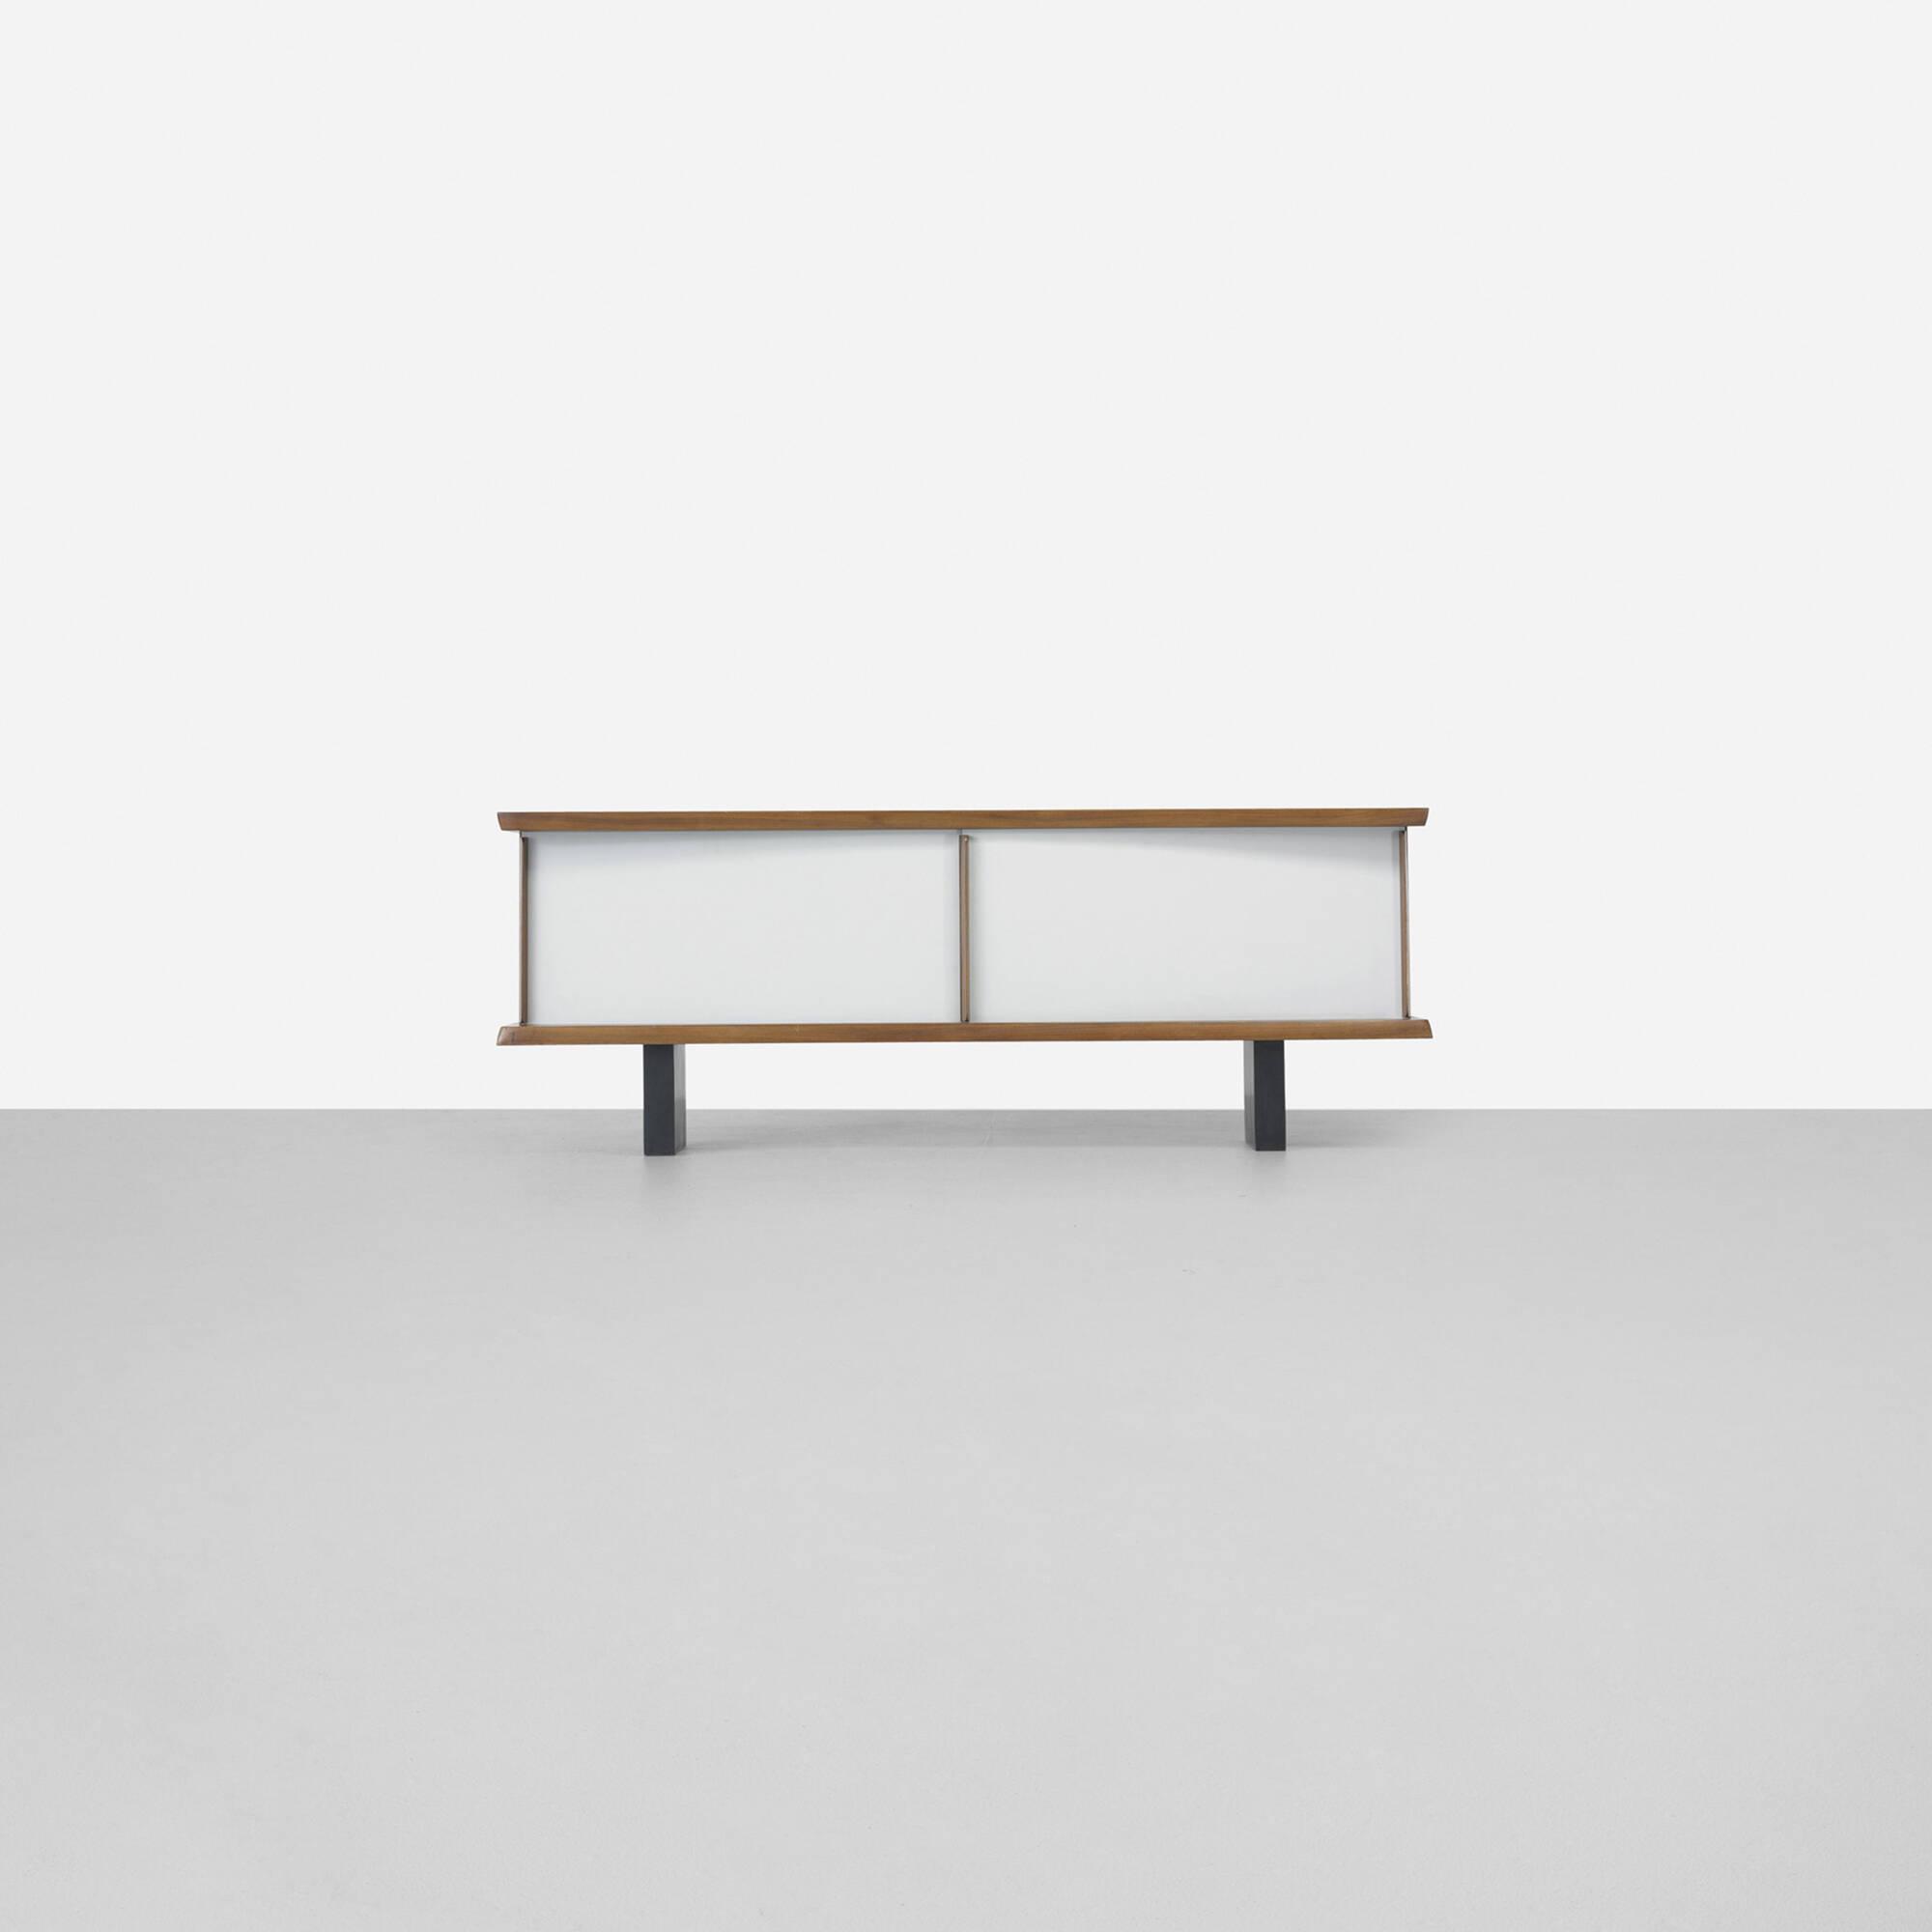 112 Charlotte Perriand Rare Bahut Important Design 7 June  # Catalogue Bahut